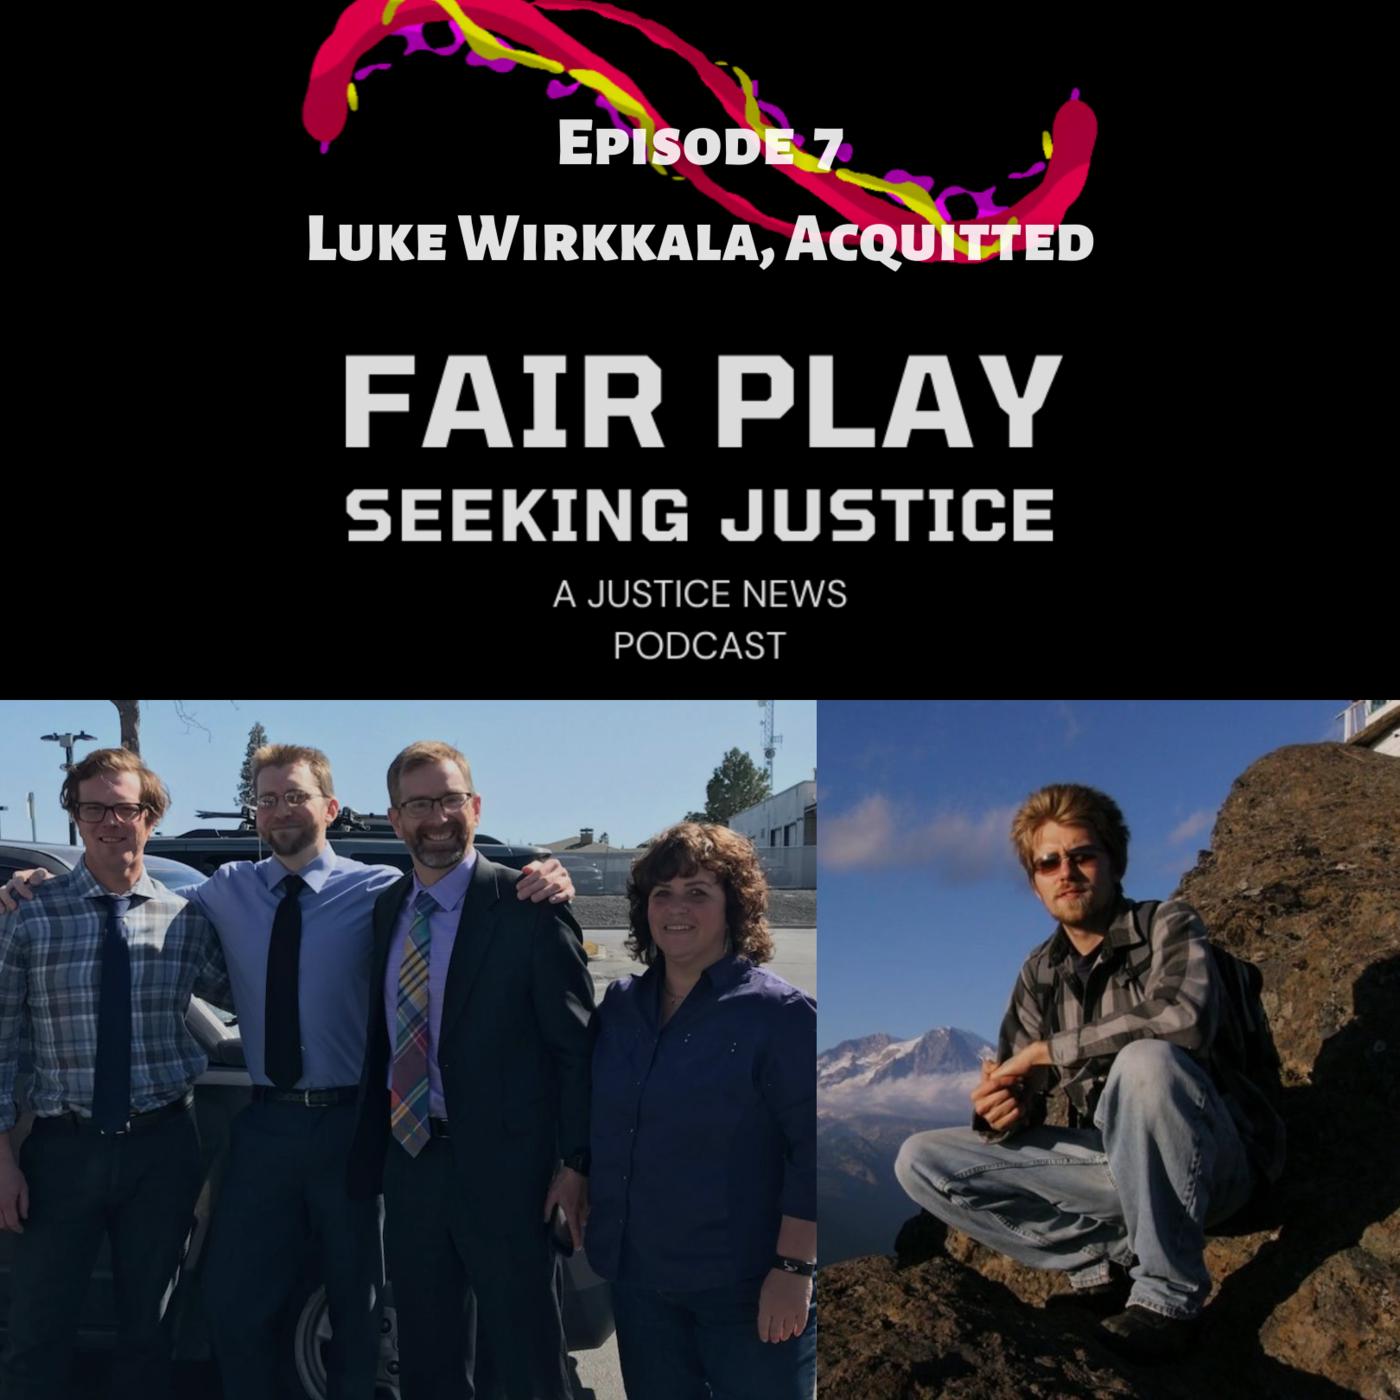 FairPlay EP7 | Luke Wirkkala, Acquitted